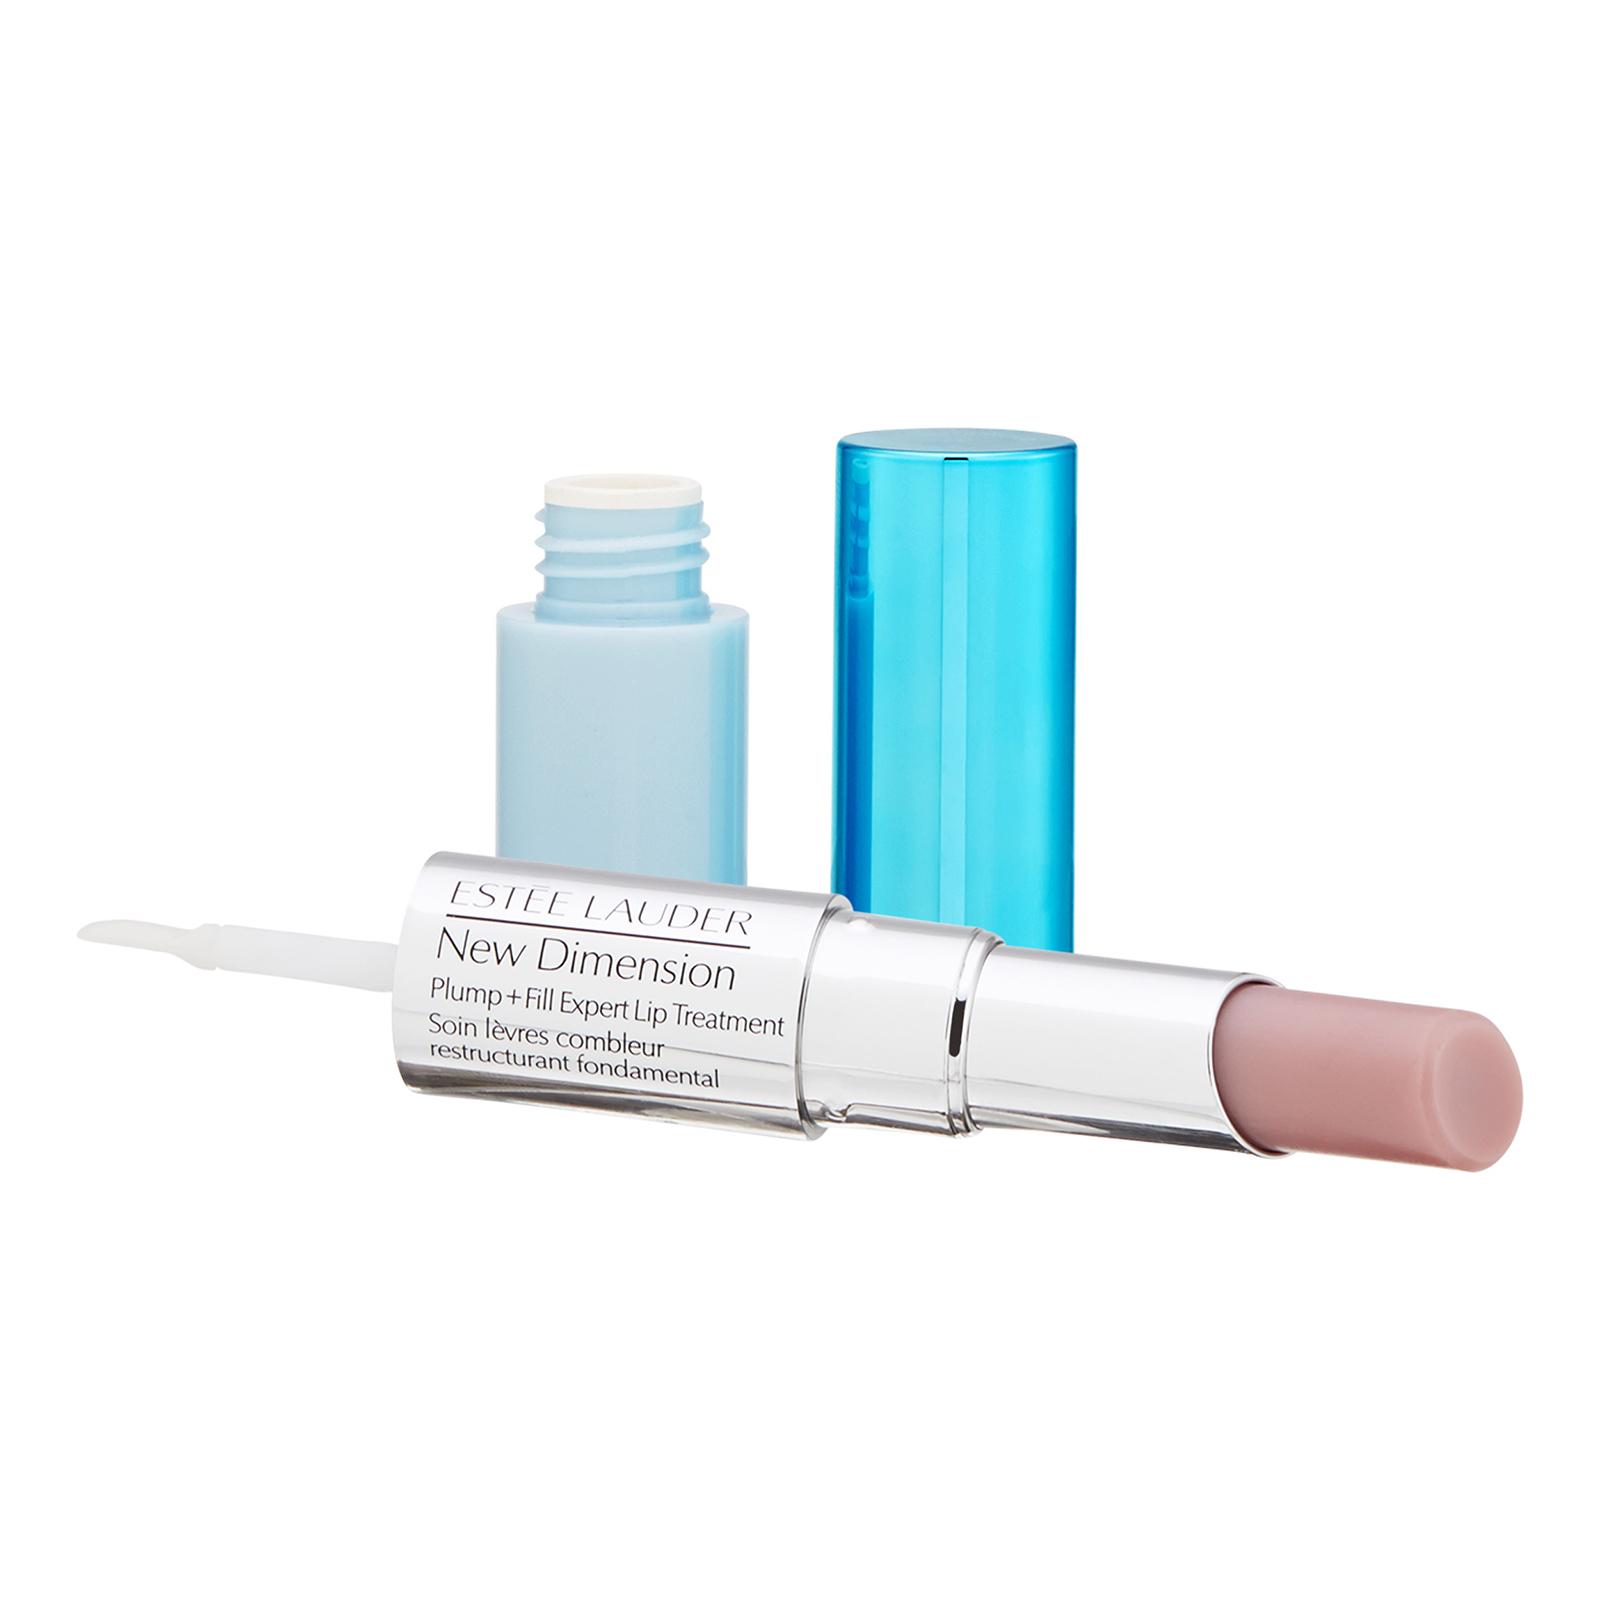 Estée Lauder New Dimension  Plump + Fill Expert Lip Treatment 0.17oz, 5ml